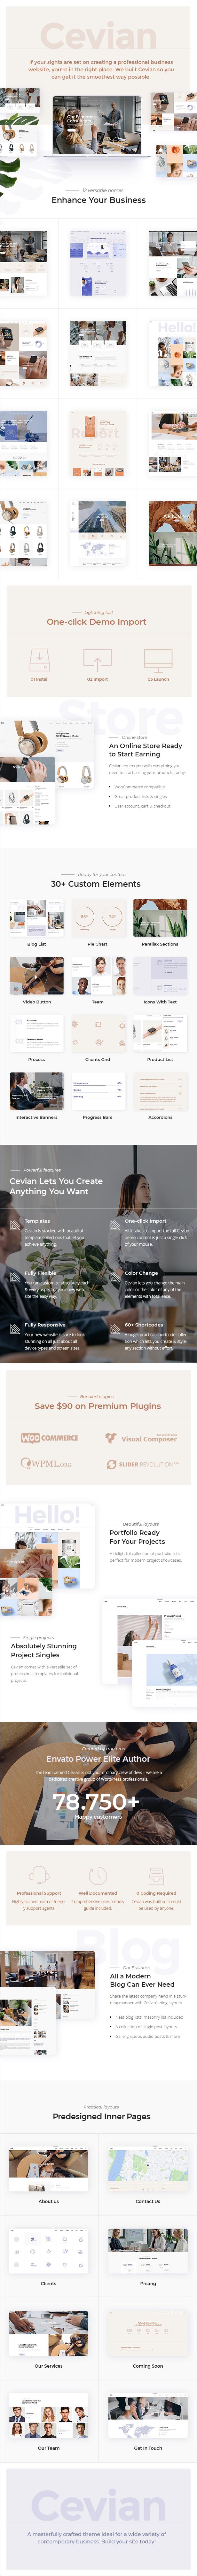 Cevian - Multipurpose Business Theme - 1